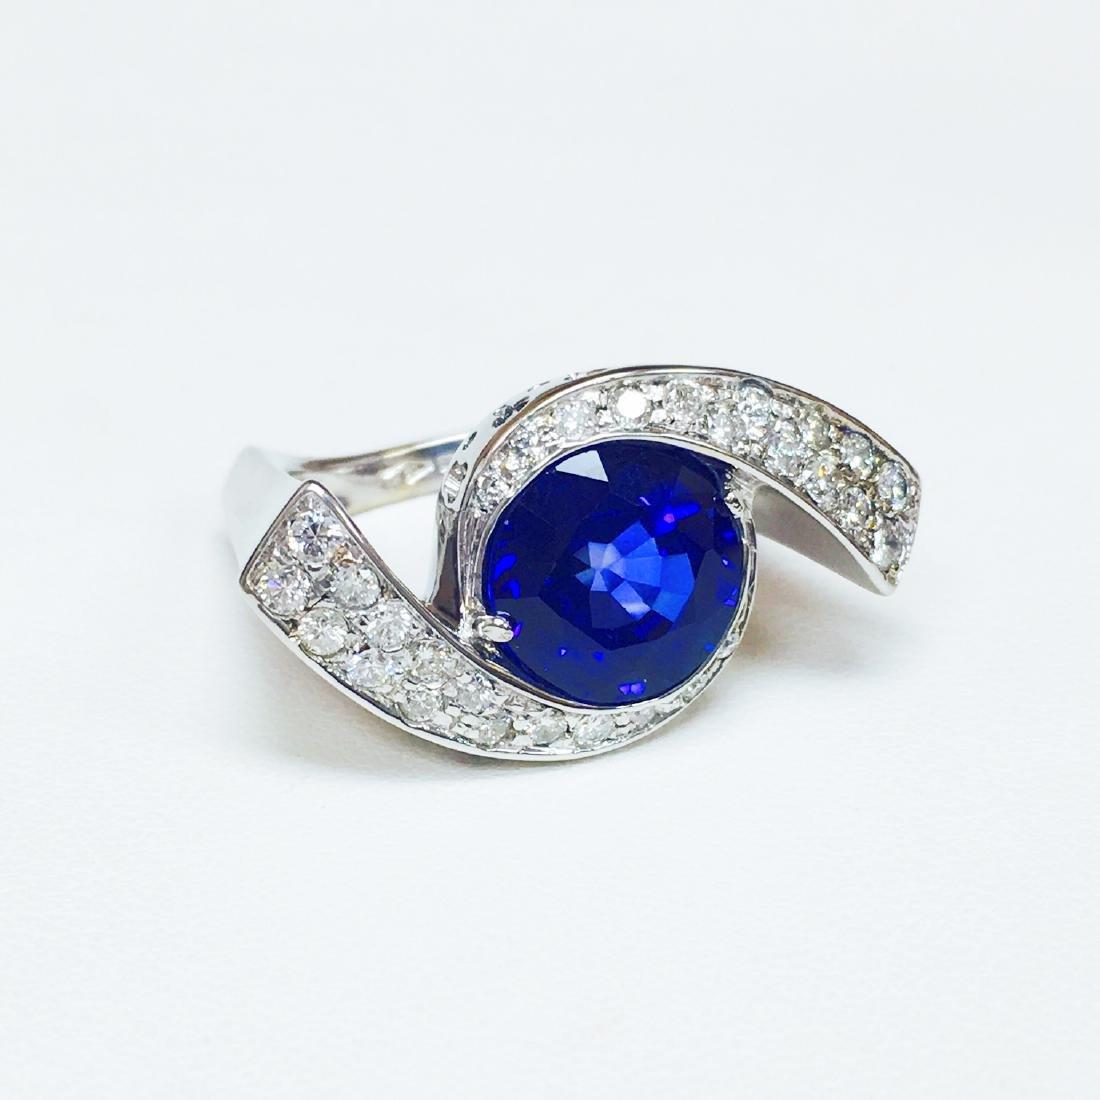 6.00 Carat Blue Sapphire & DIAMOND EVIL EYE STYLE RING - 2